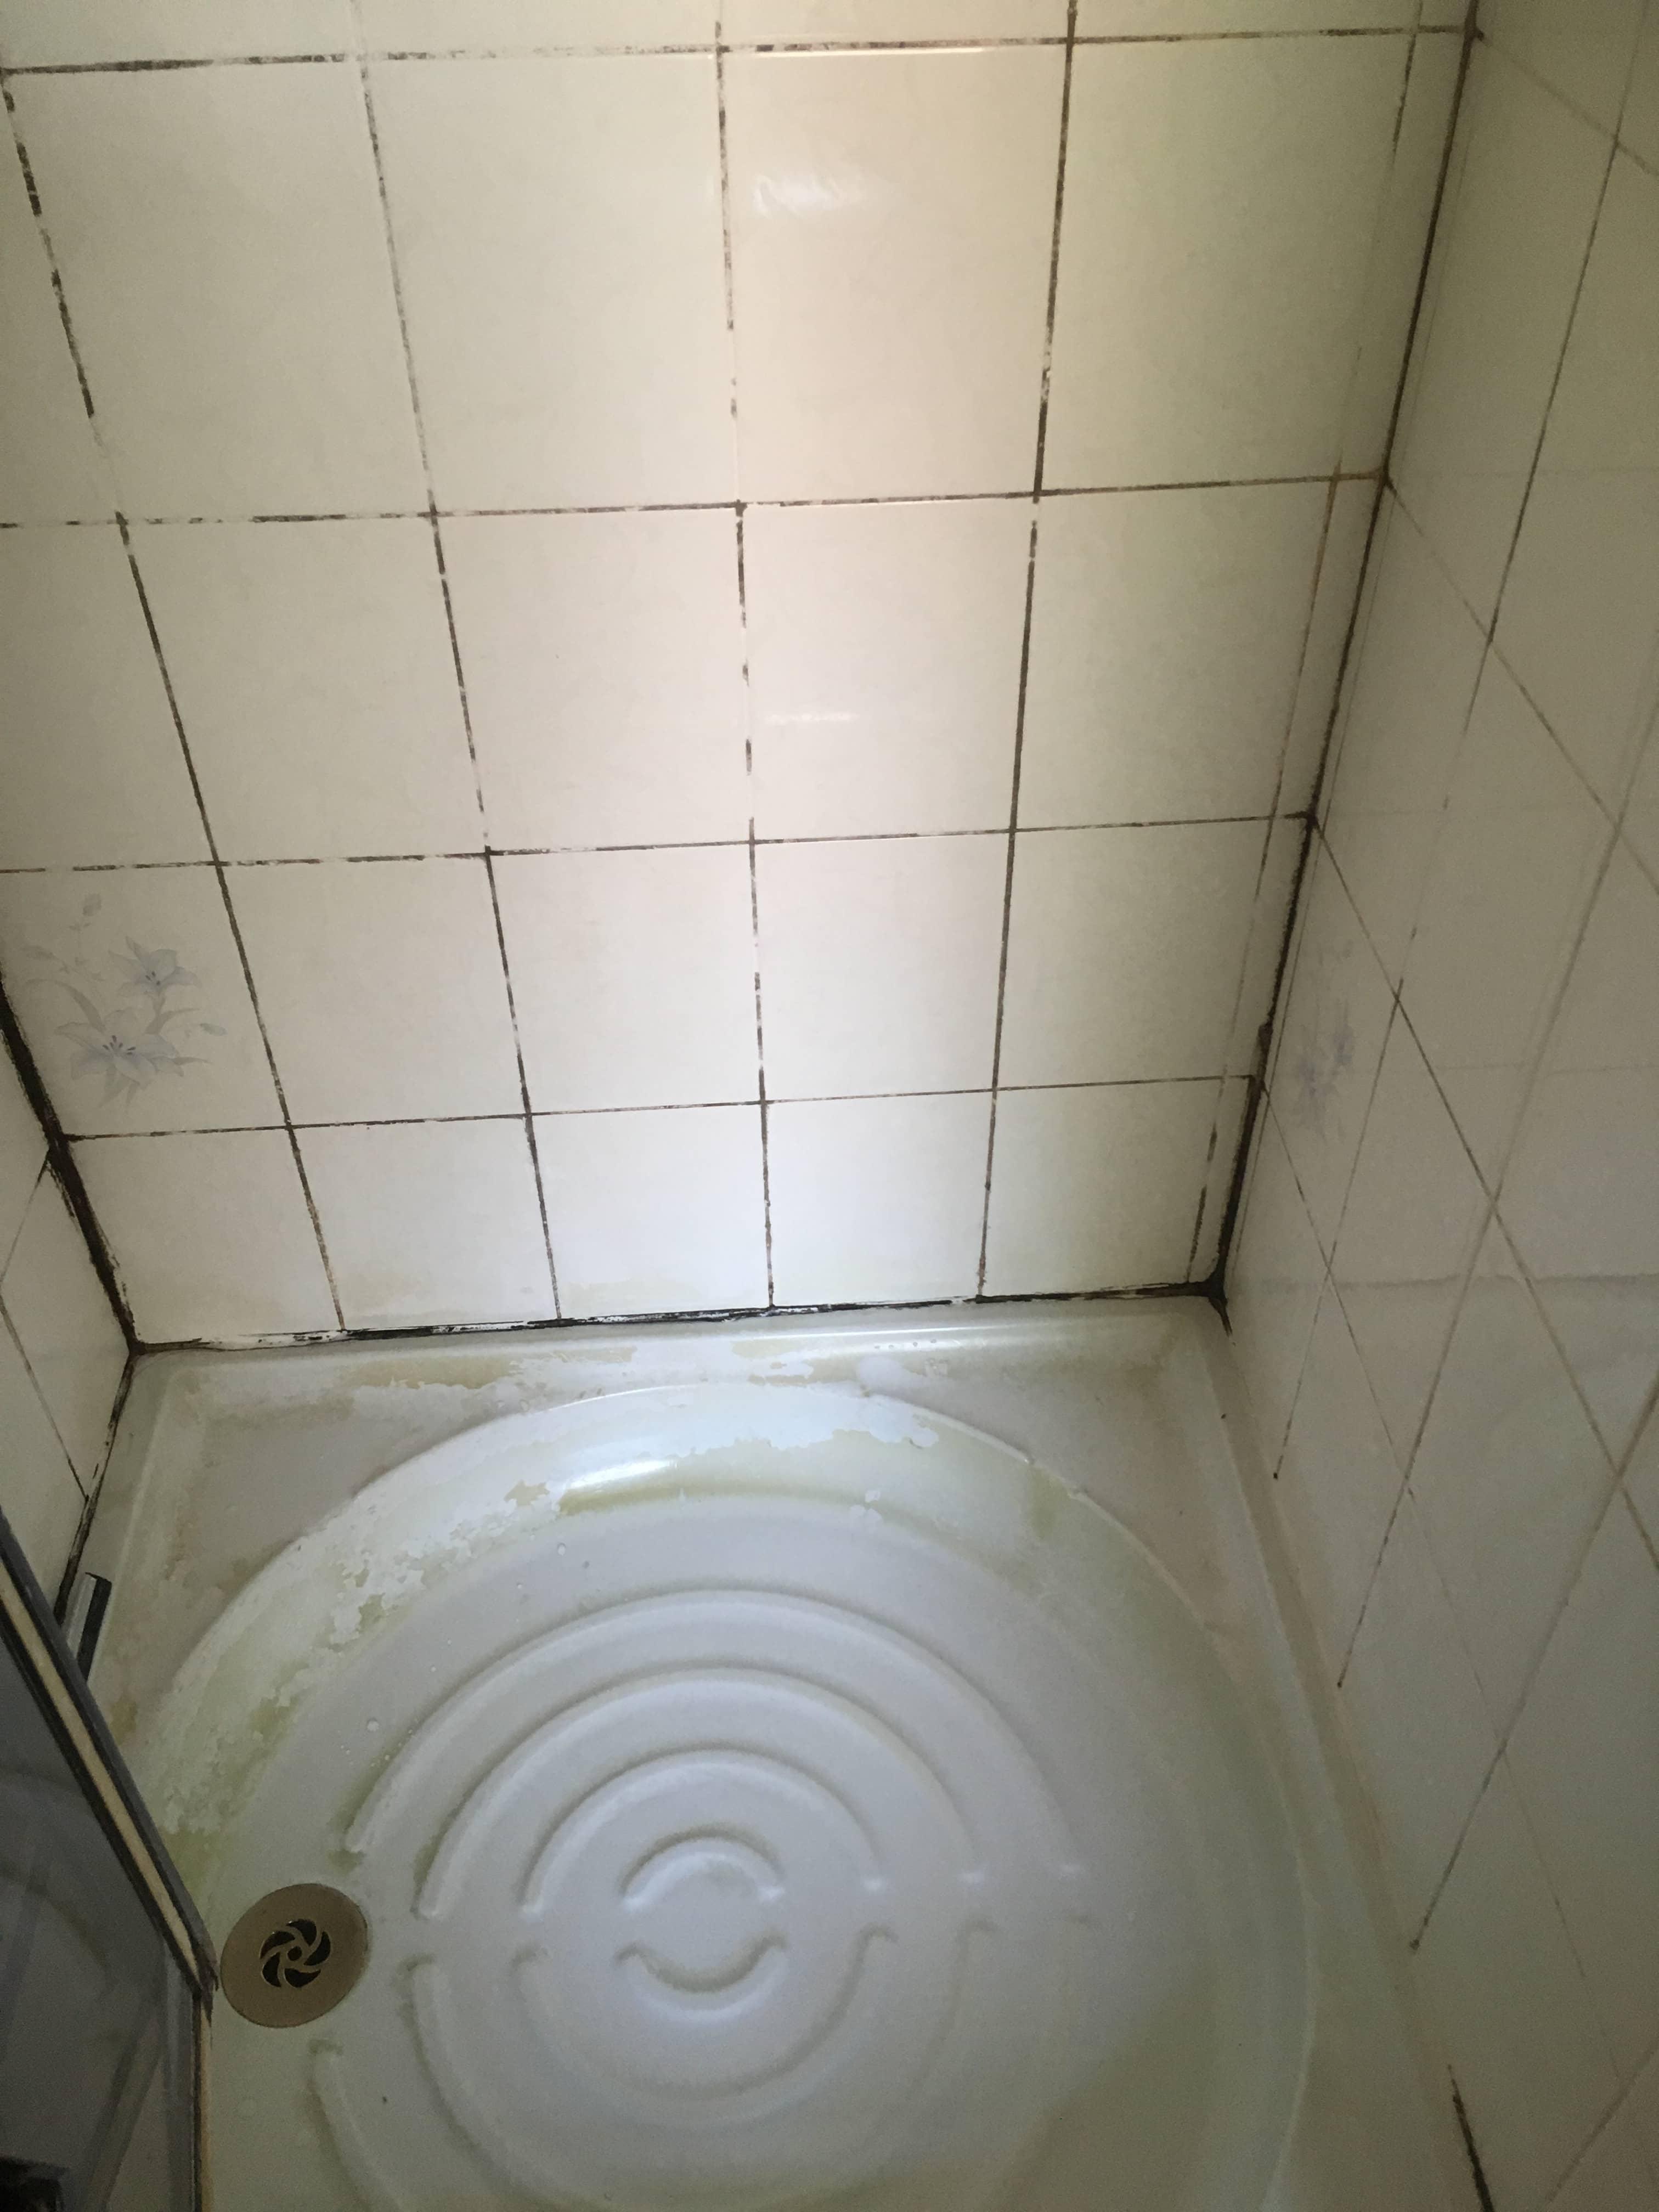 Grubby Shower Cubicle Before Renovation Chorlton Cum Hardy Rental Property